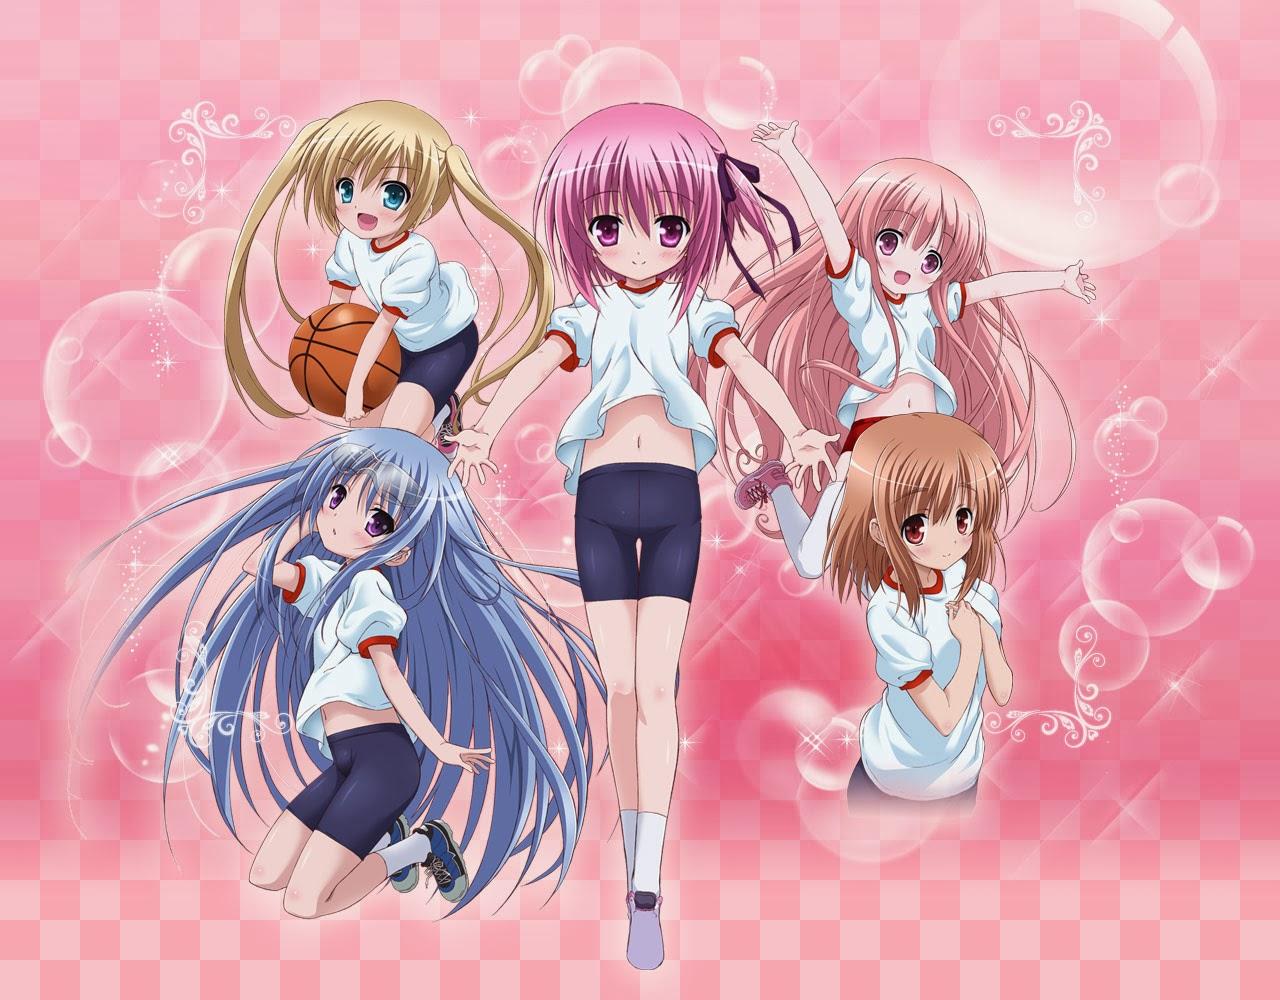 ro-kyu-bu ss cap 9 - AnimeJQ: Blog de Anime Y Manga